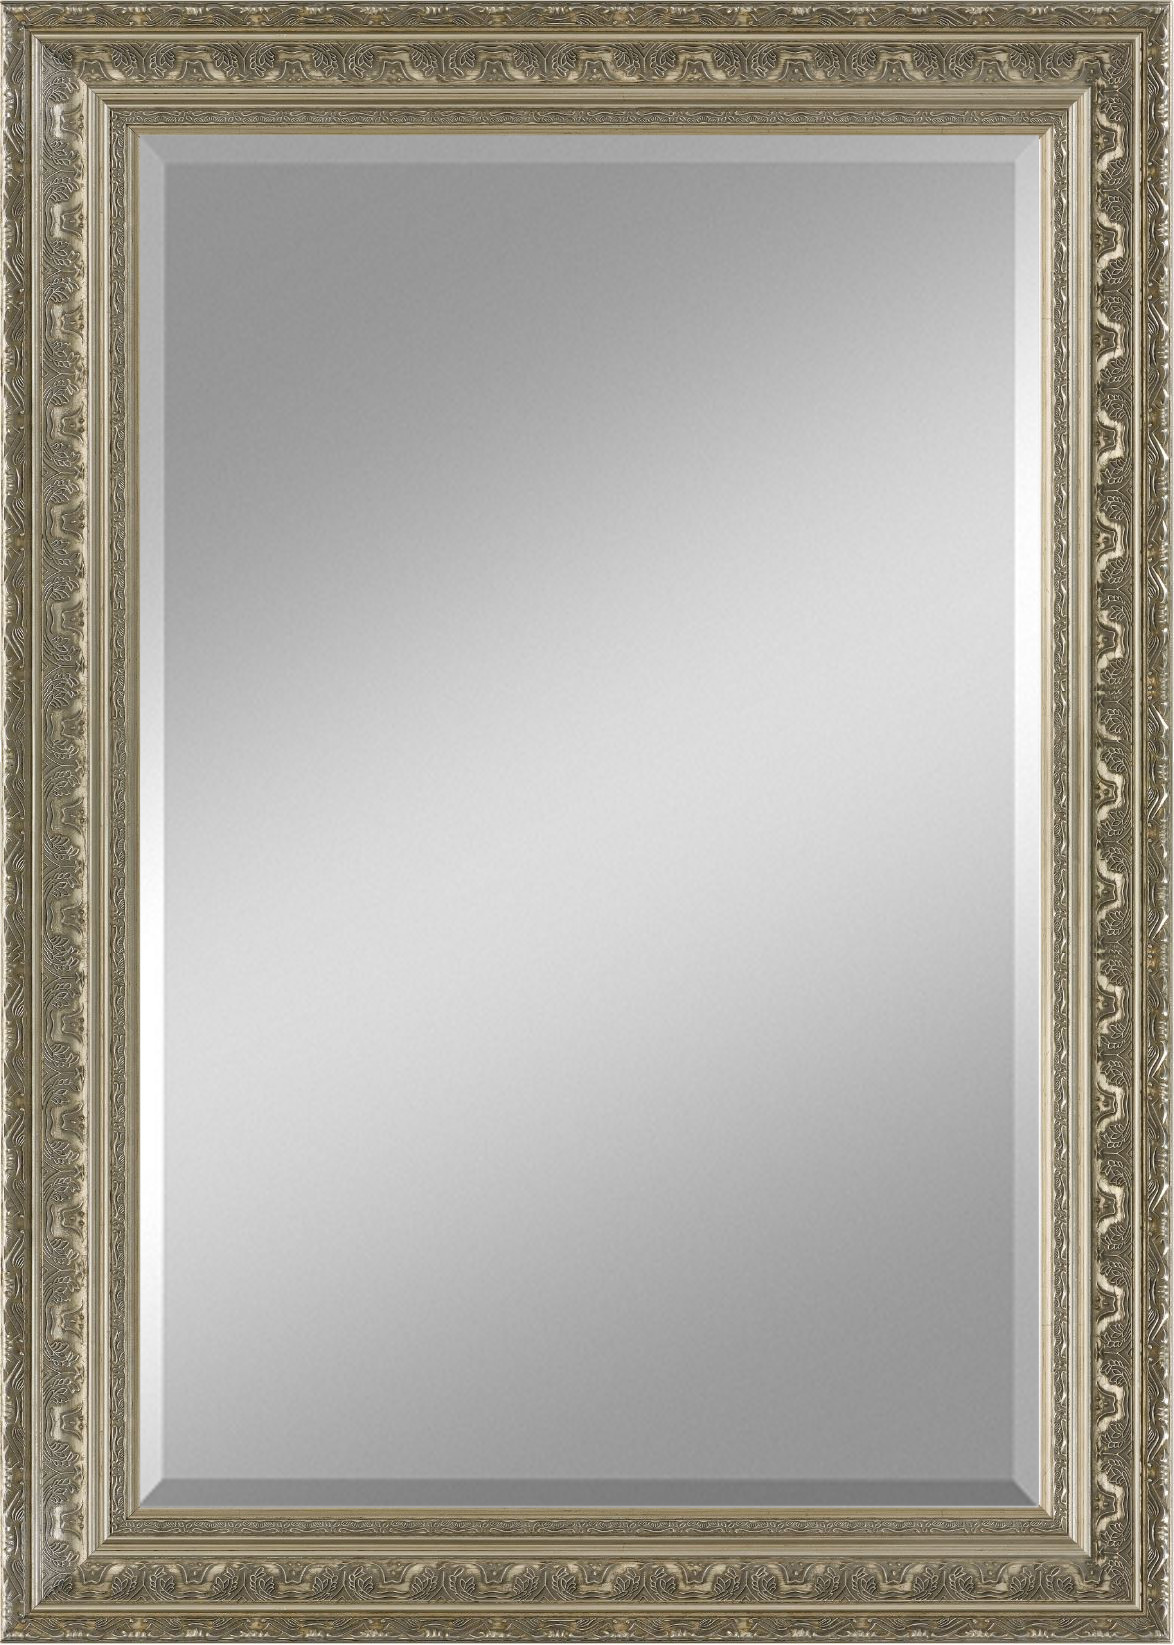 Zalena Rahmenspiegel Gulliver mit edlem Muster